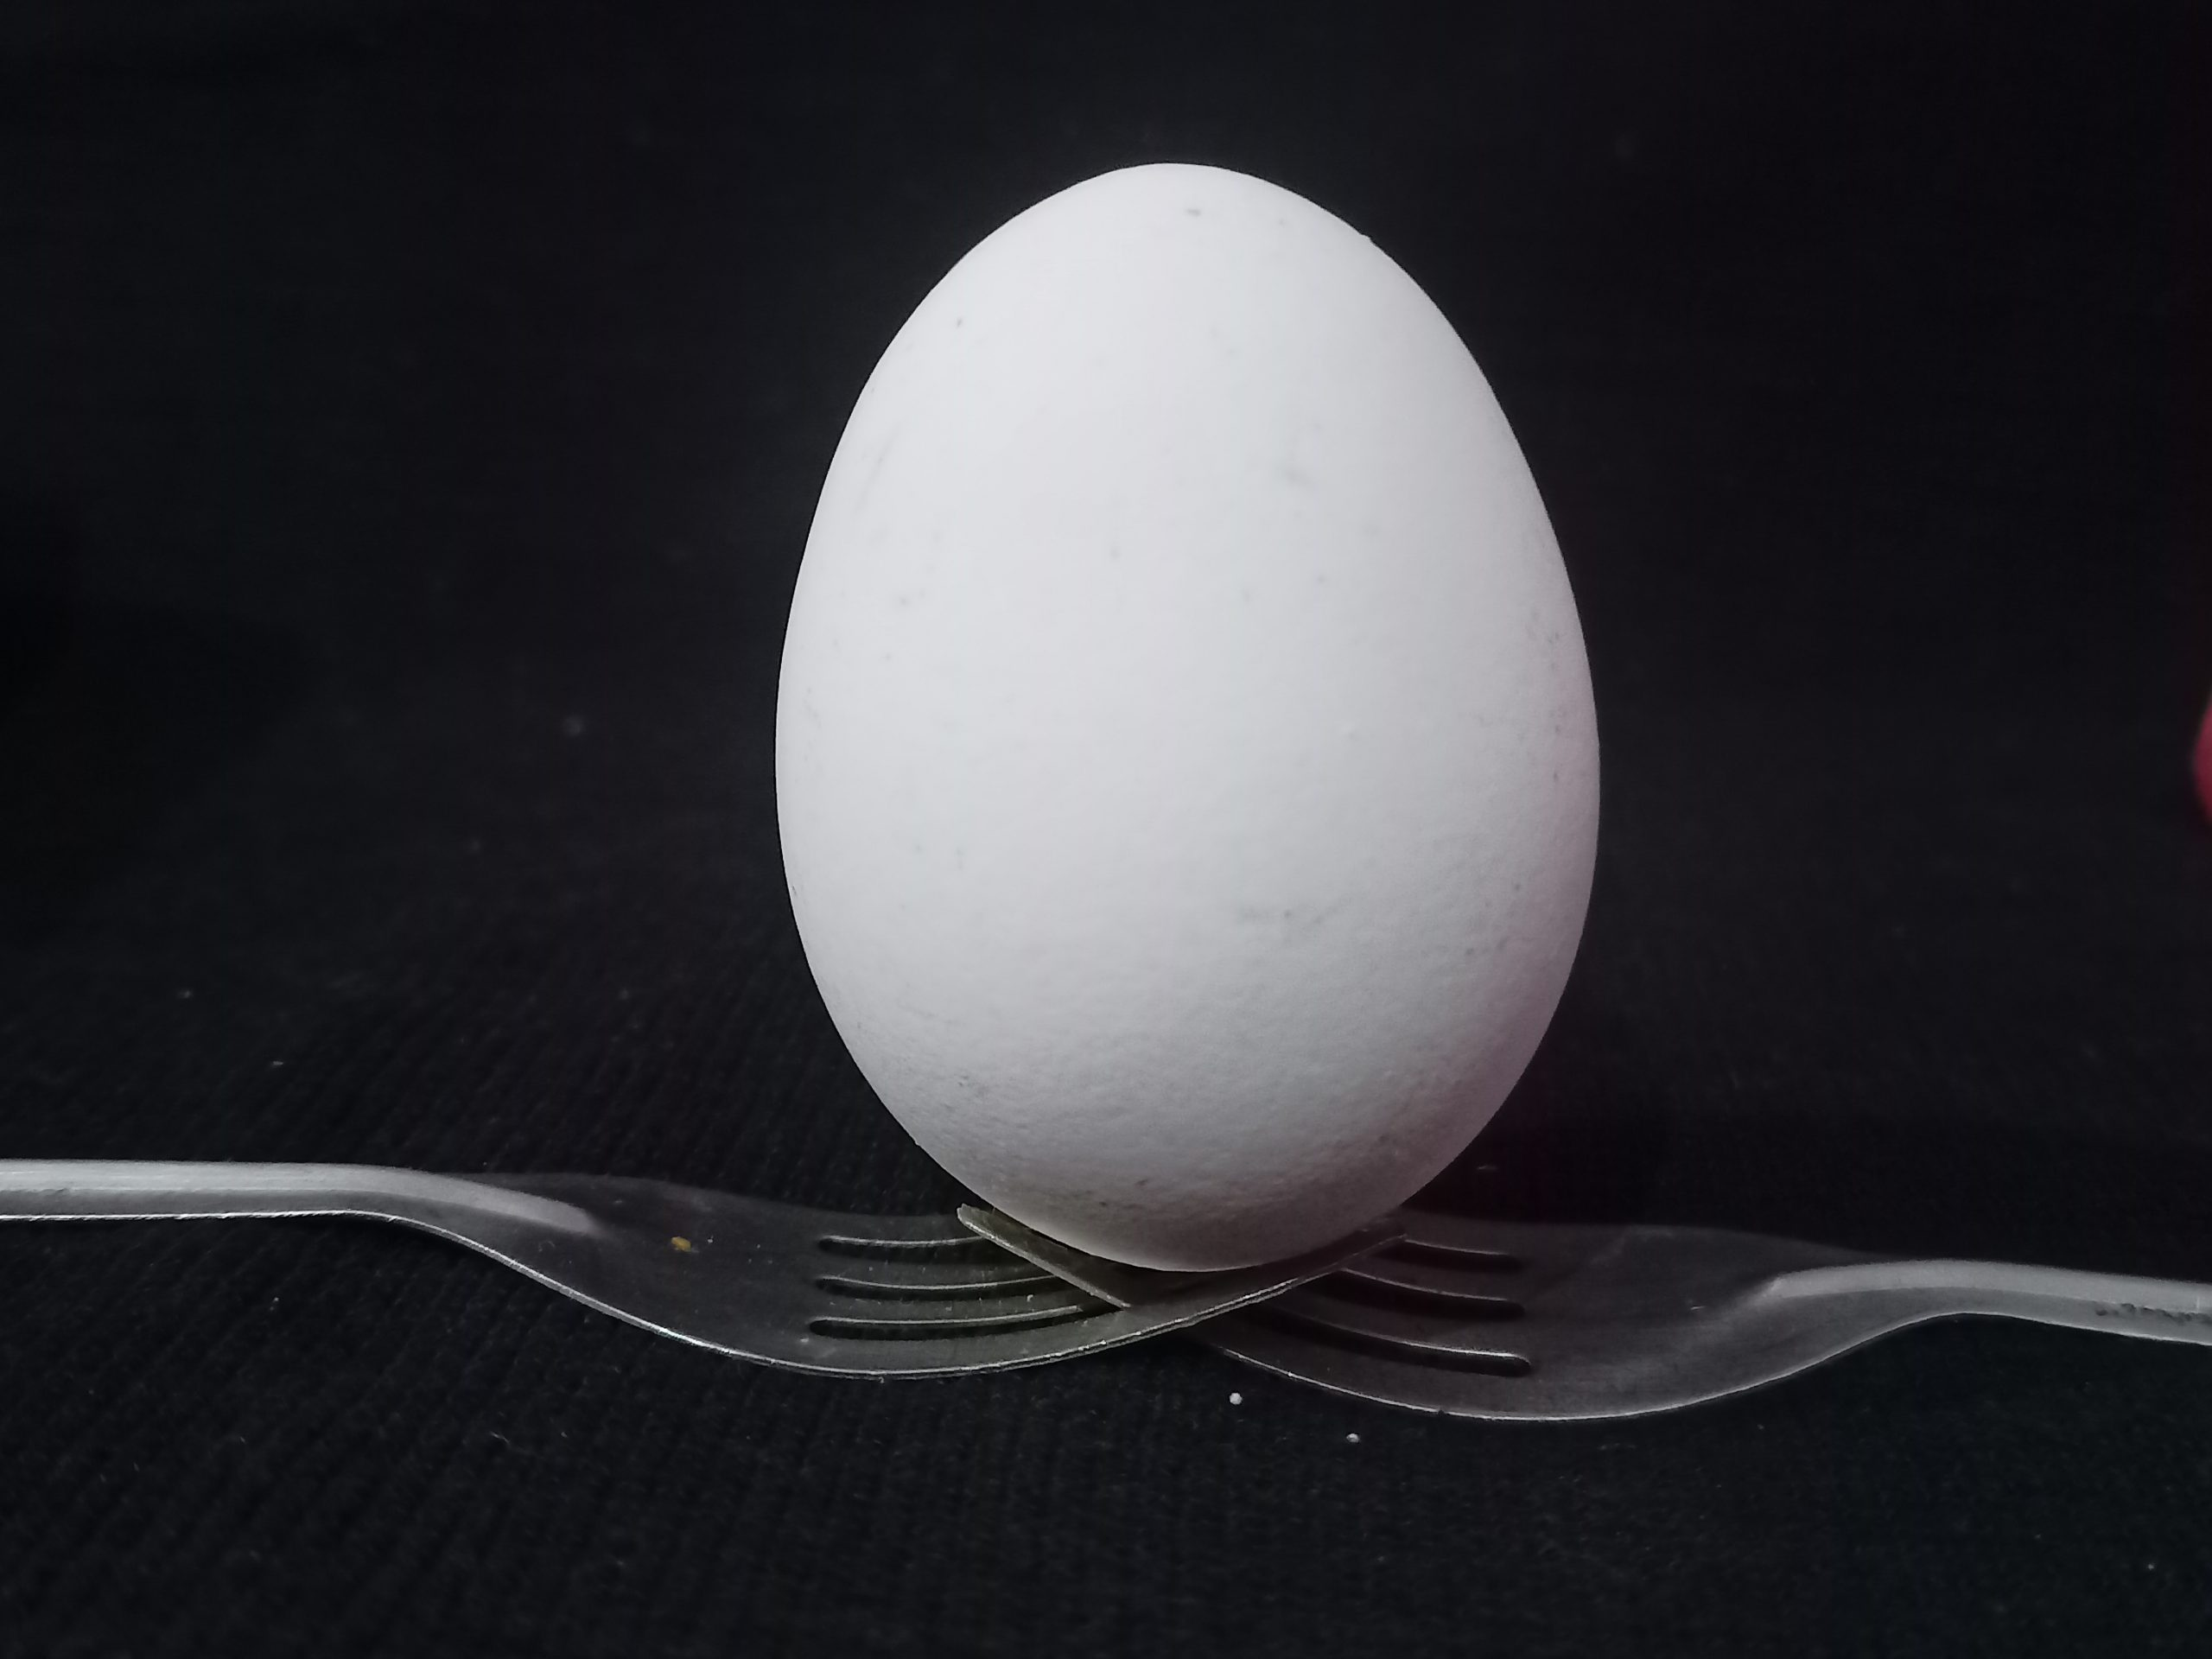 White Egg Close-up